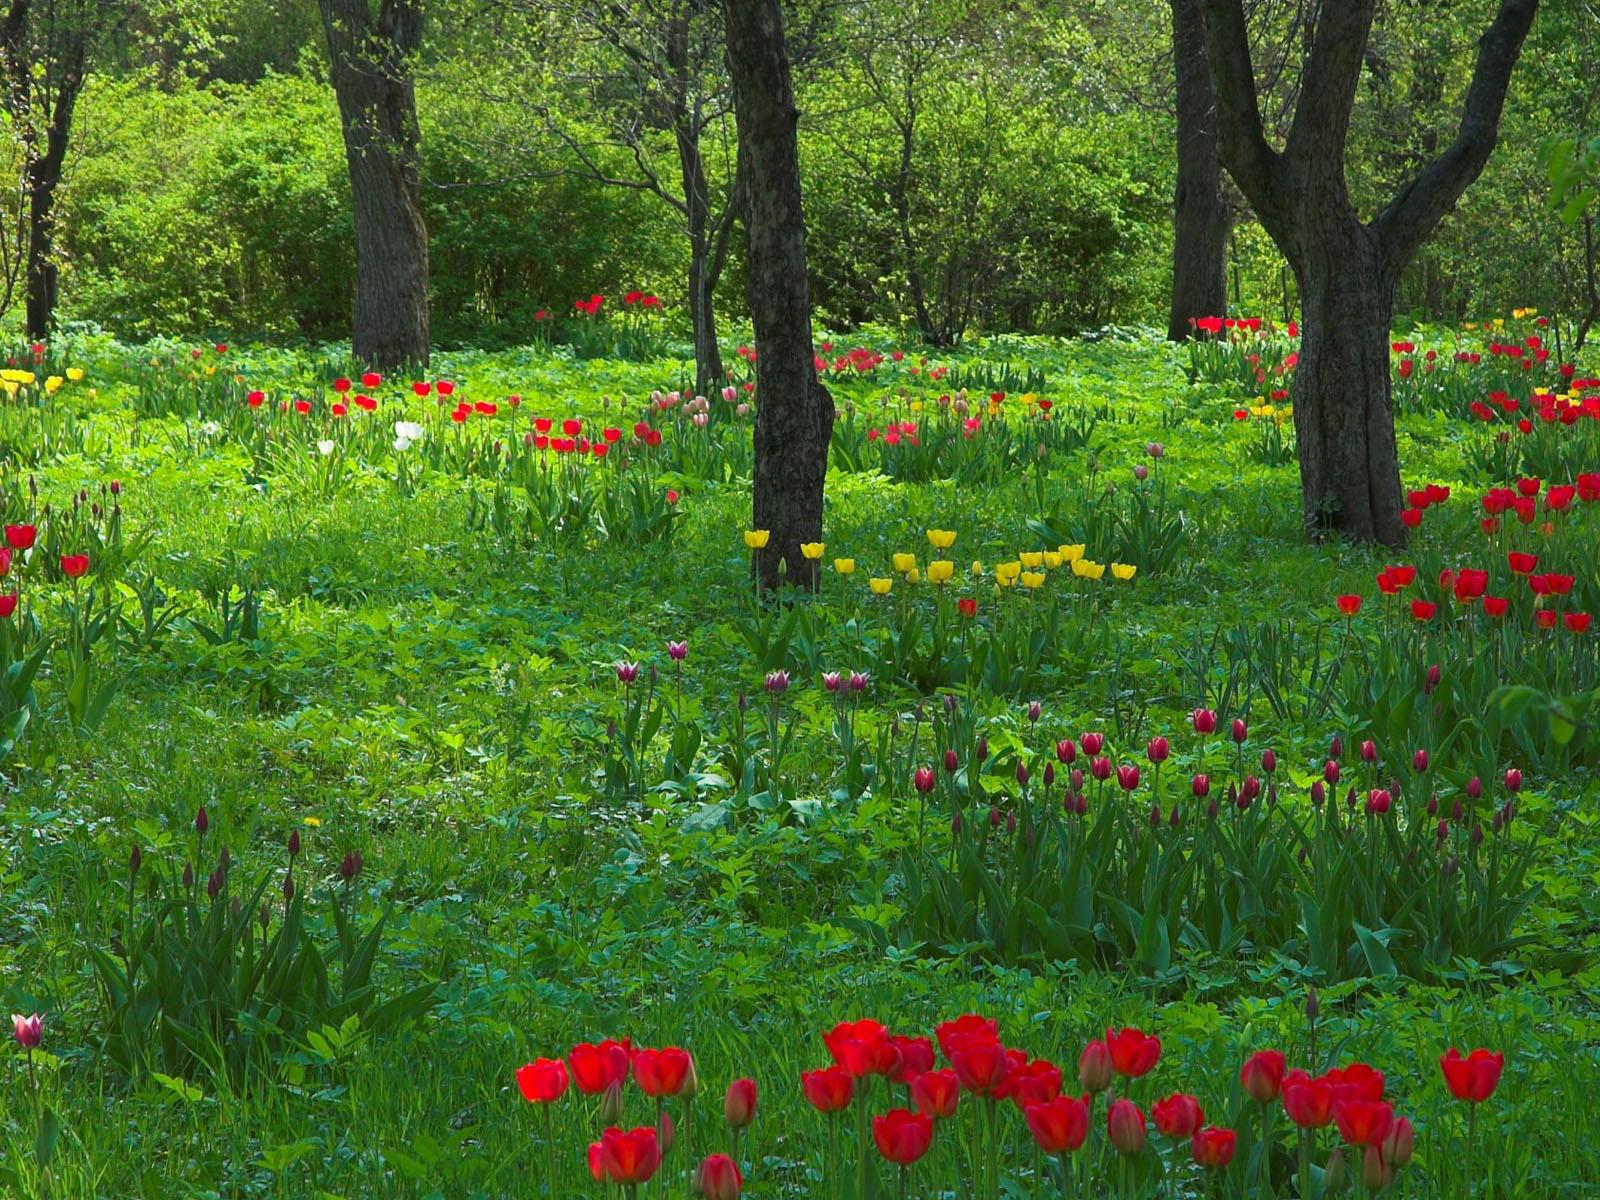 Sfondi Primavera Hd Tulipani Sfondi Hd Gratis